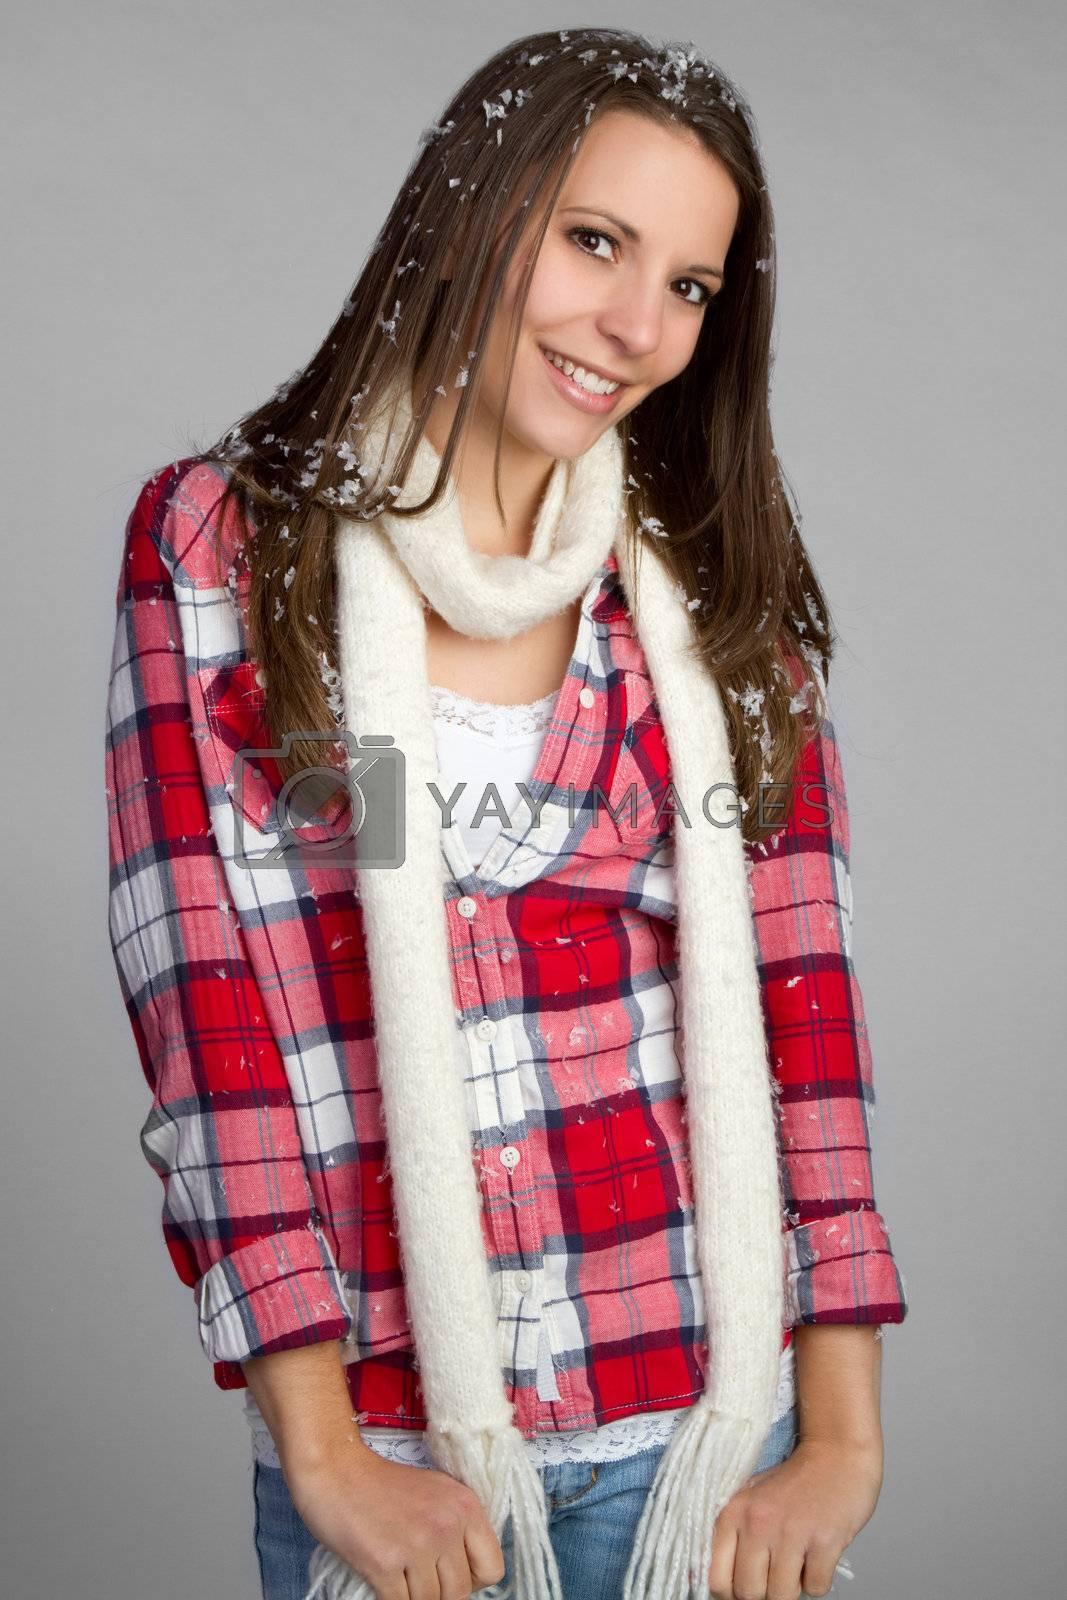 Pretty winter teen girl smiling